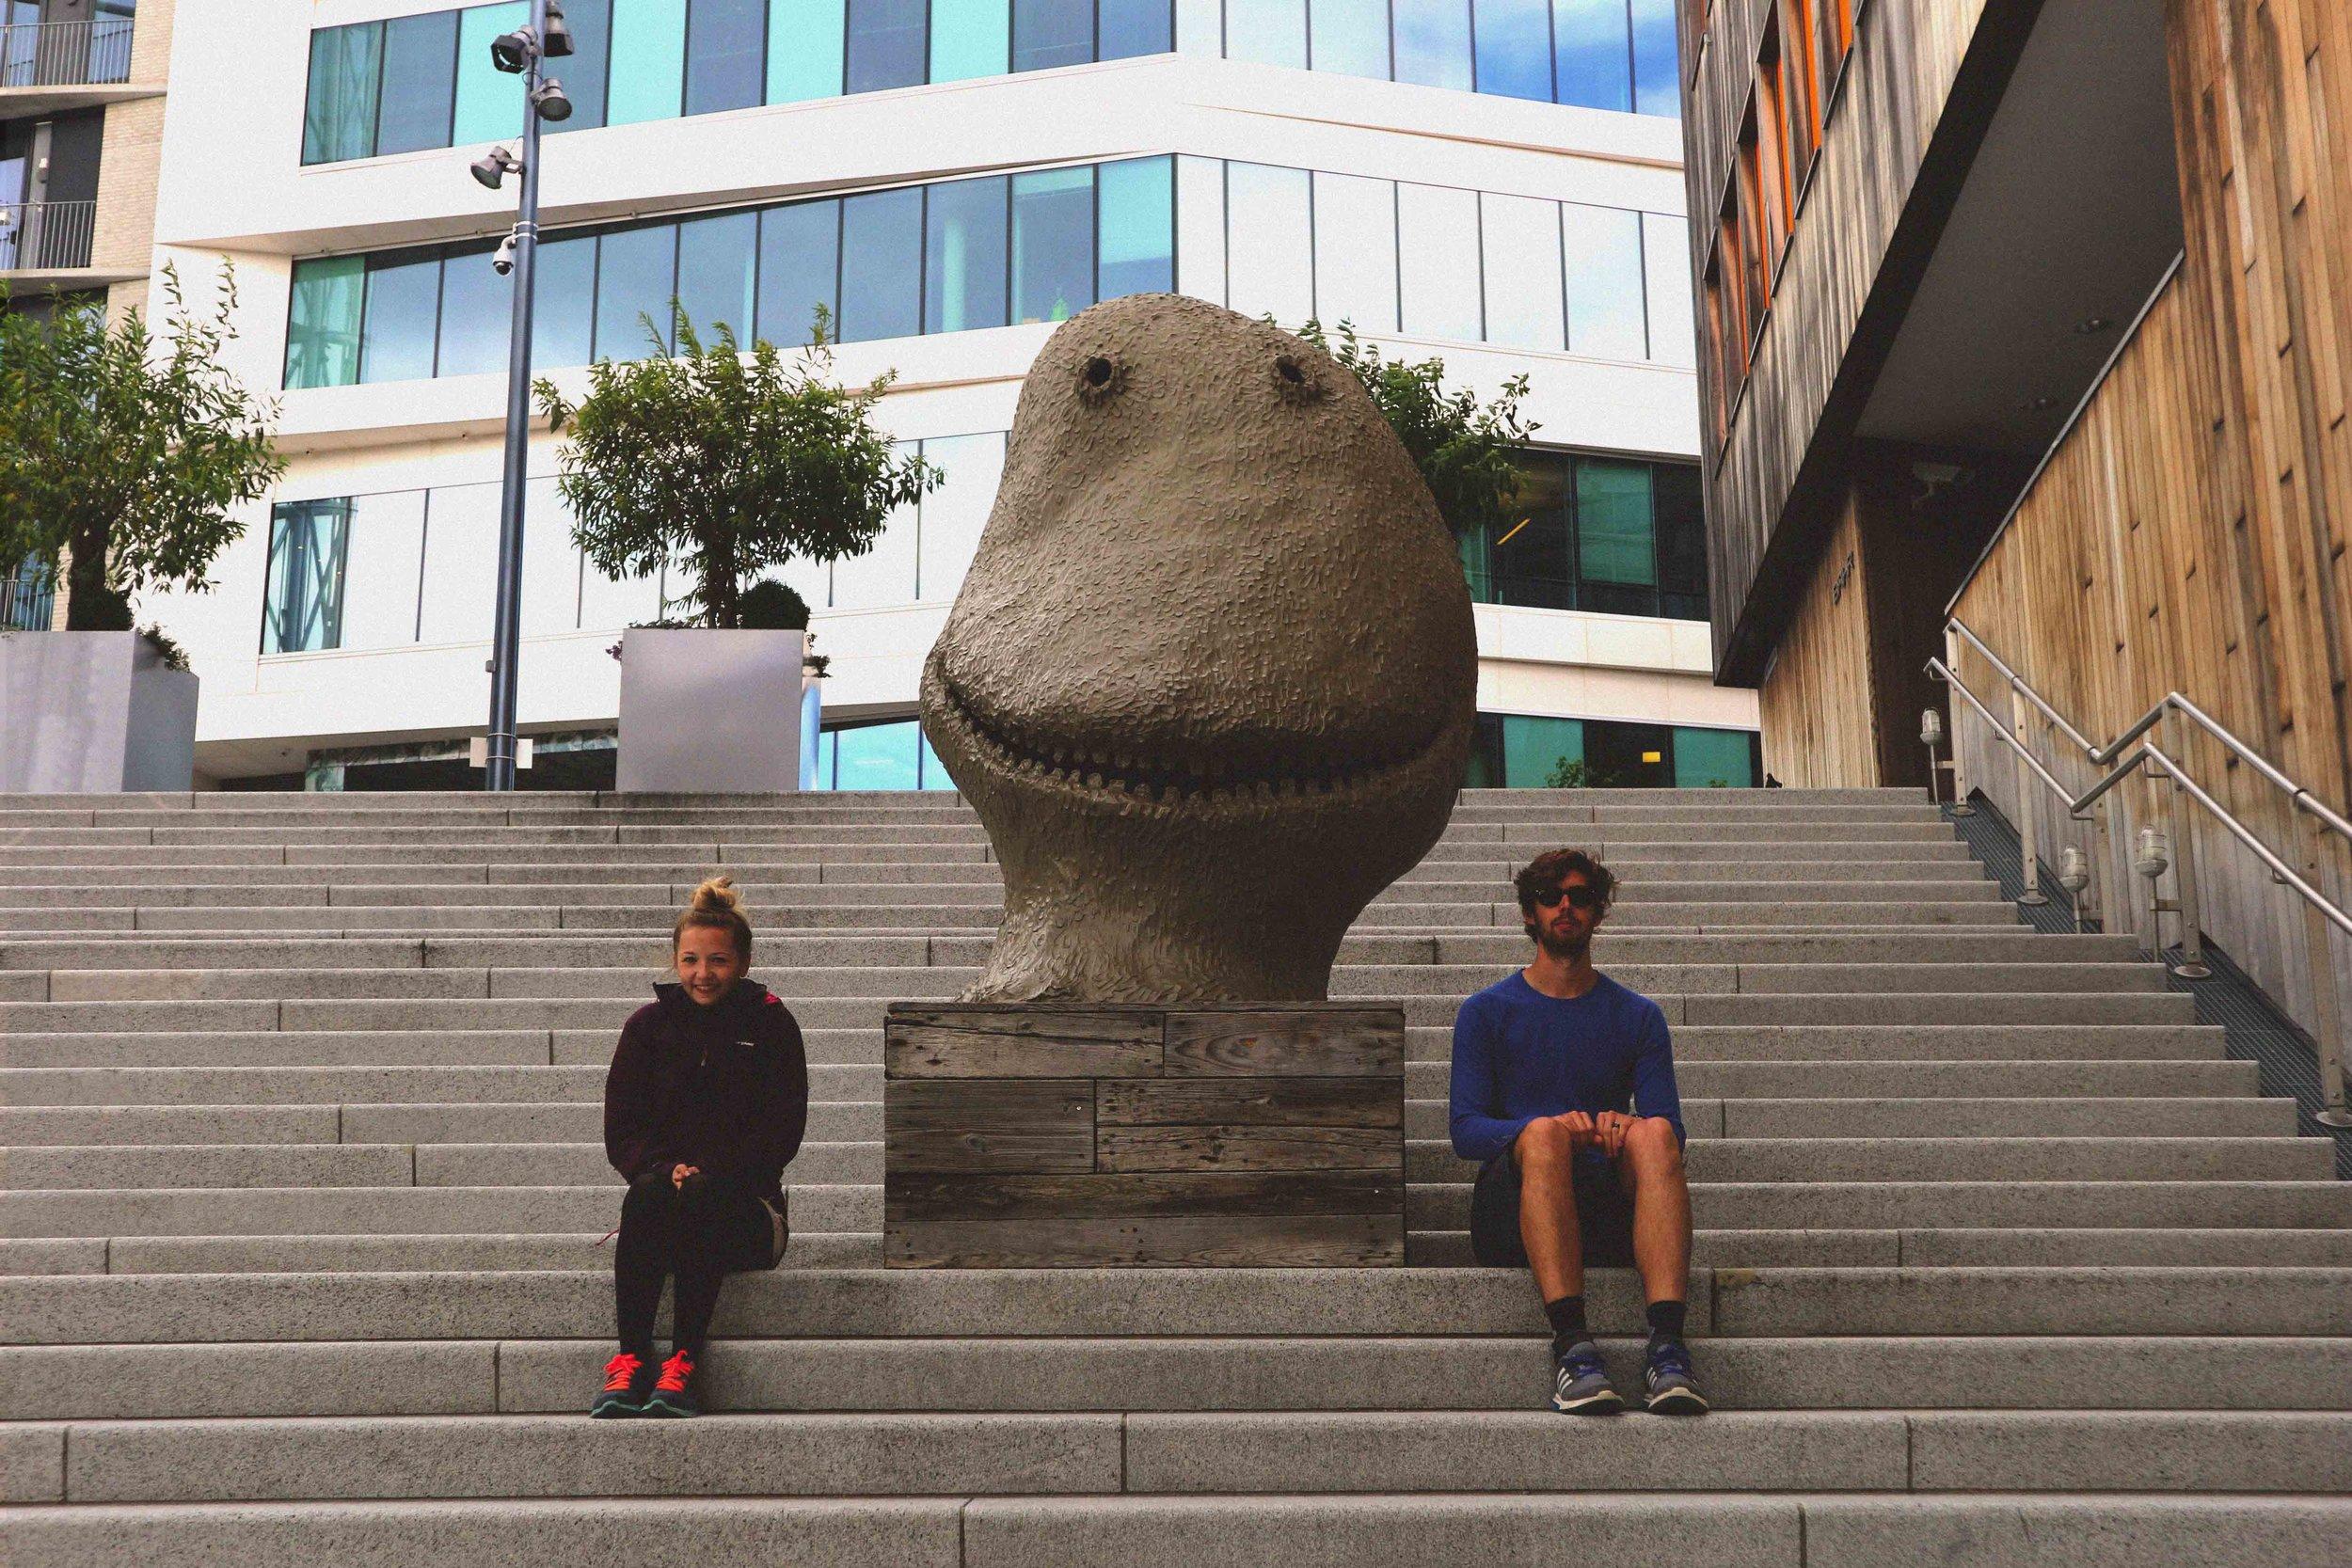 oslo sculpture 3.jpg